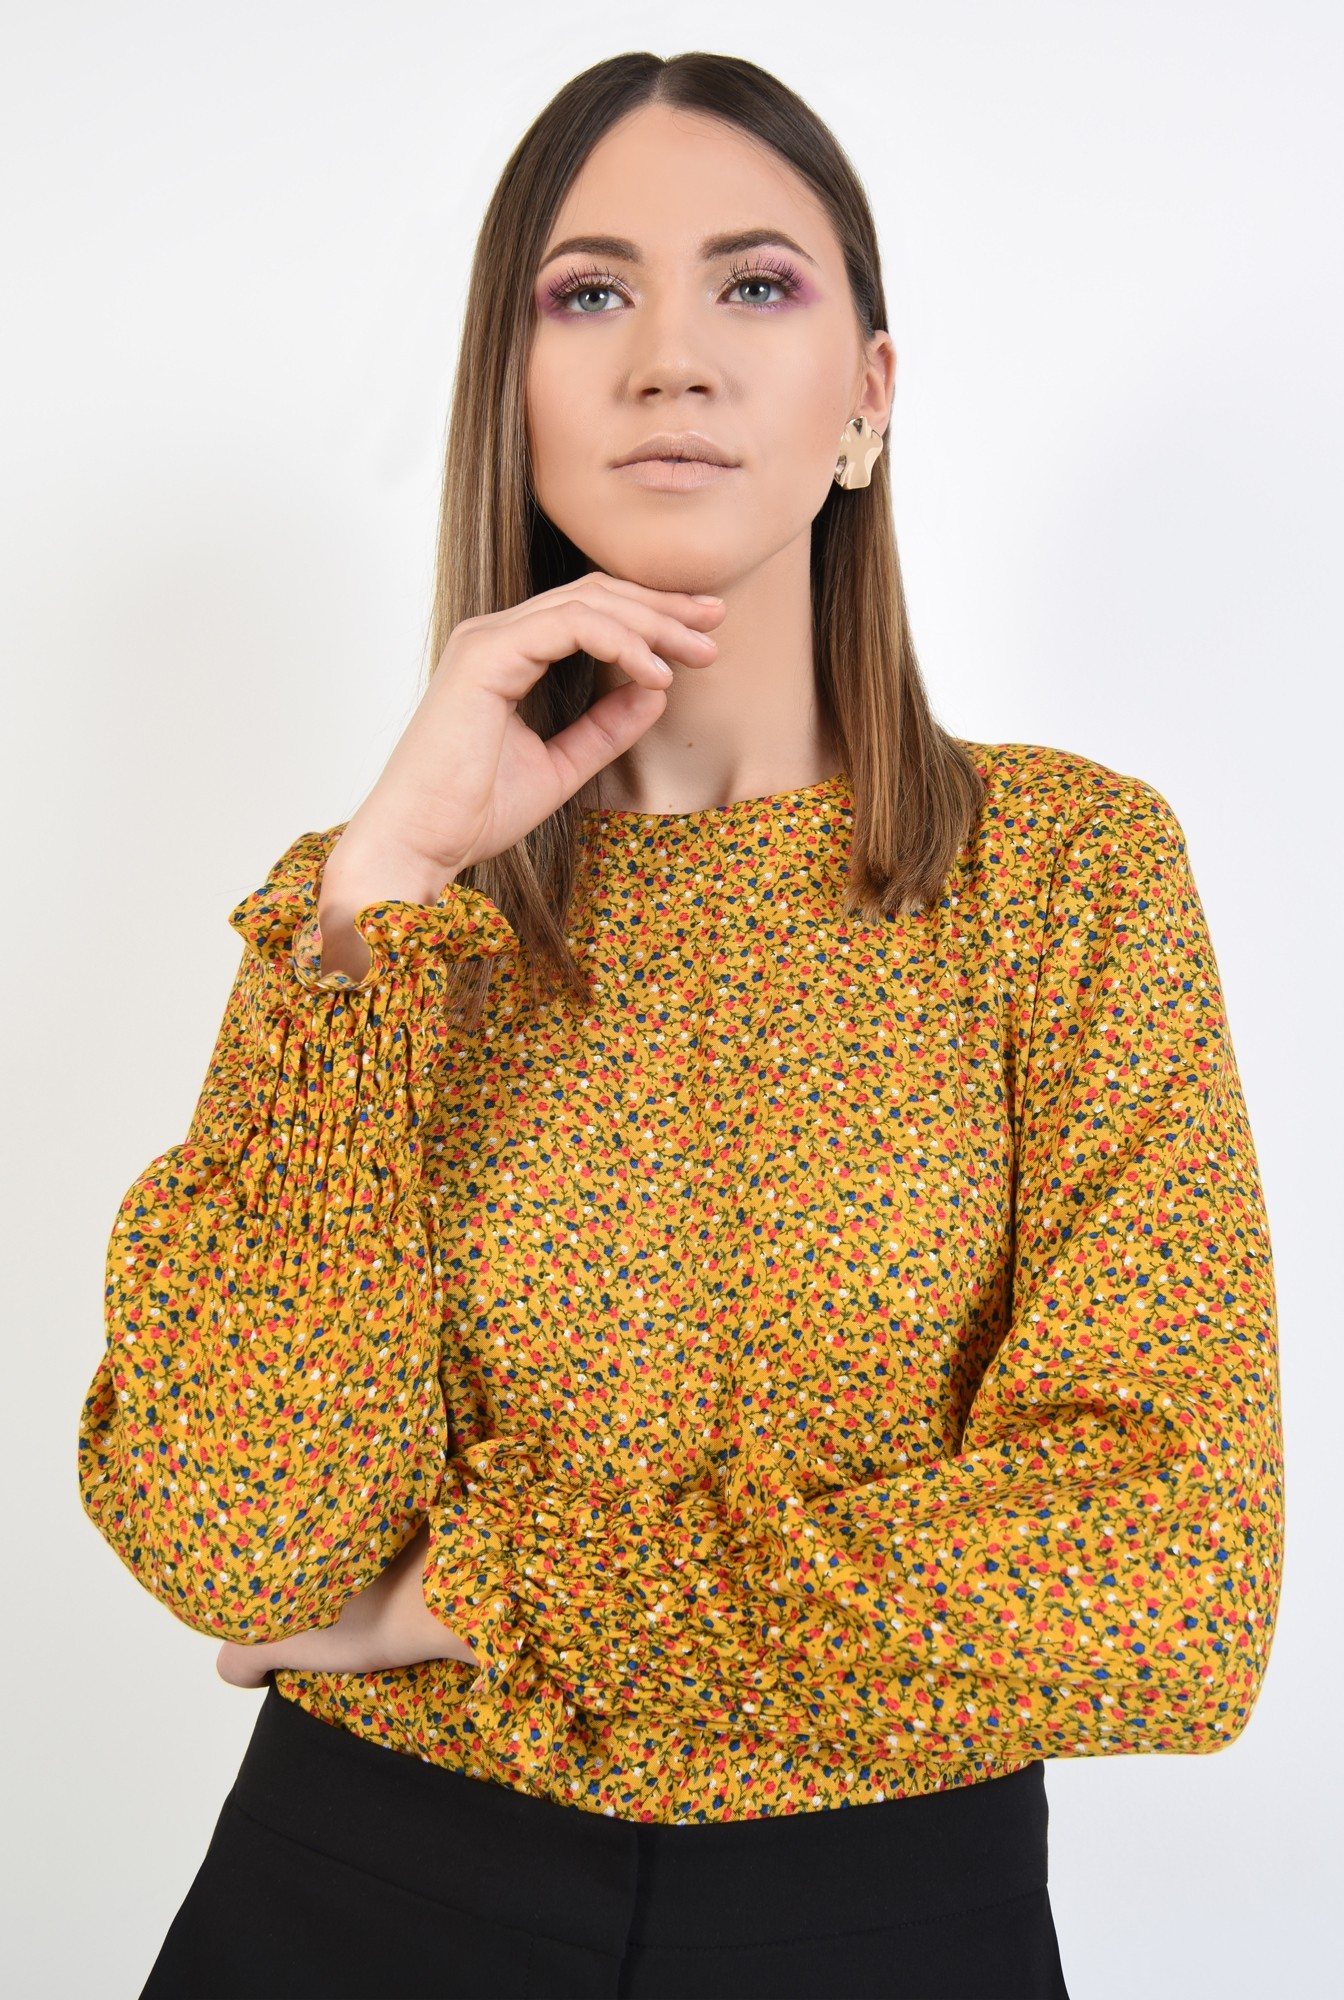 0 - 360 - bluza casual, din viscoza imprimata, maneci lungi cu mansete elastice